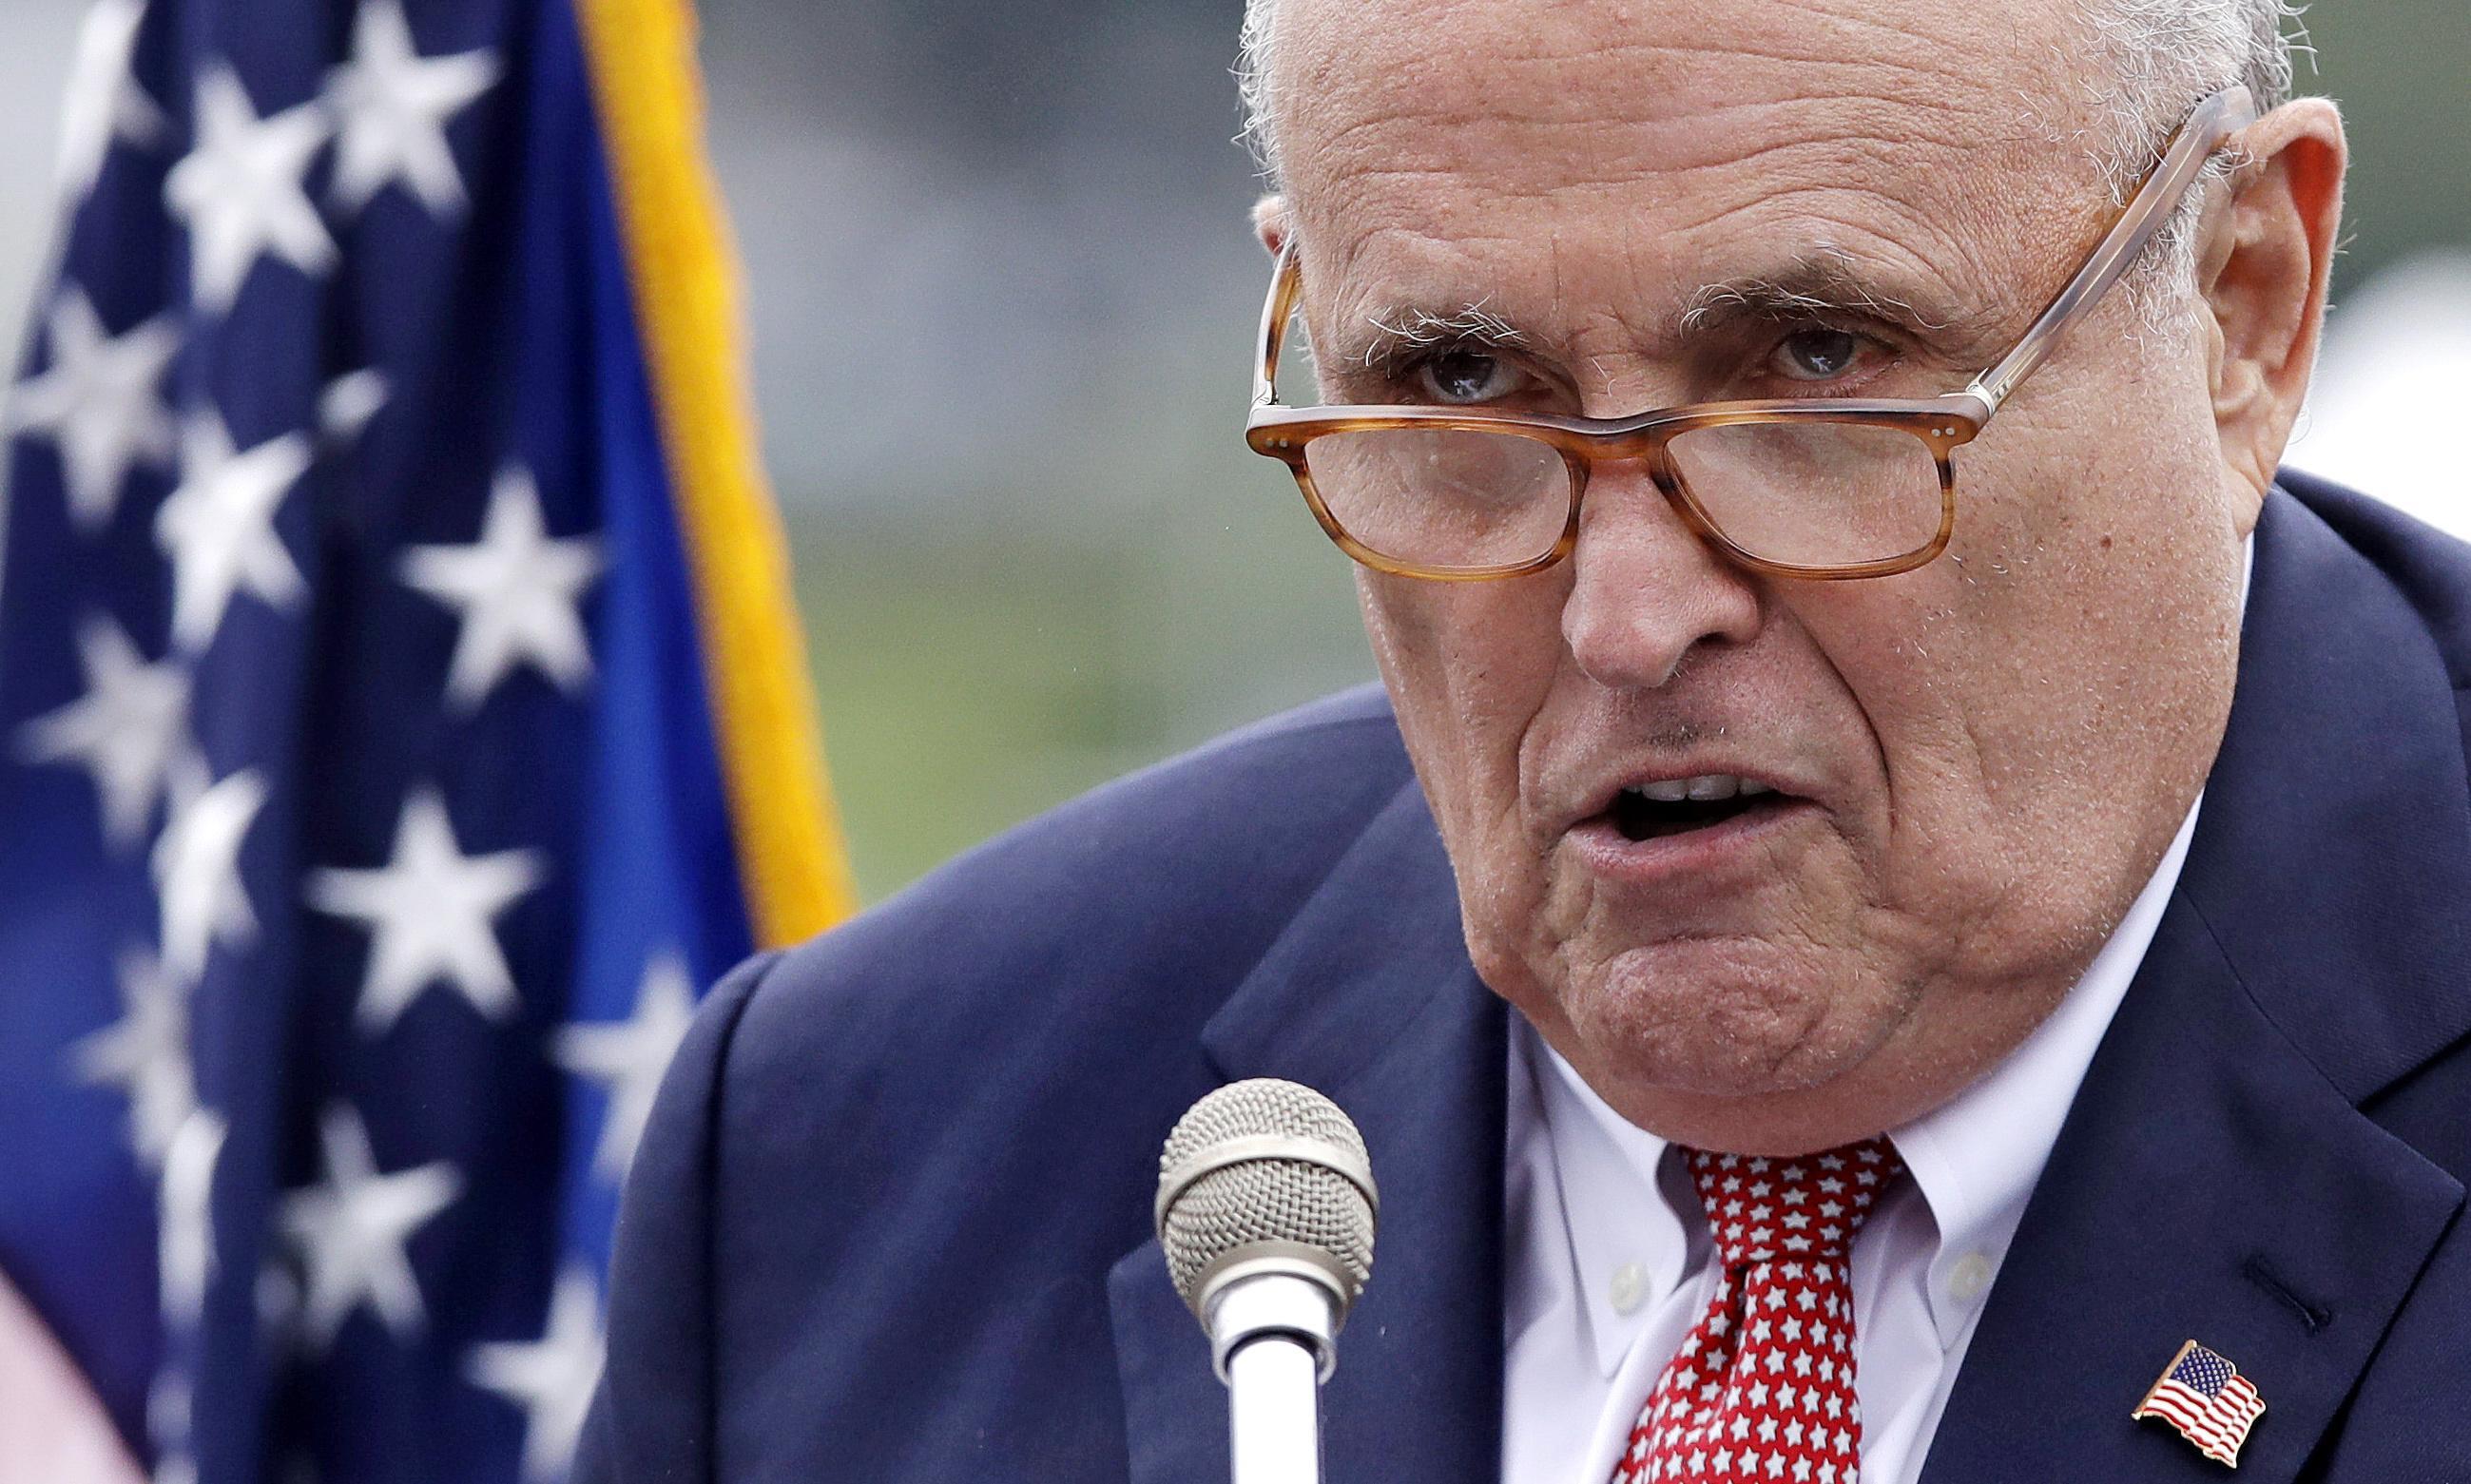 Rudy Giuliani is Donald Trump's real secretary of state